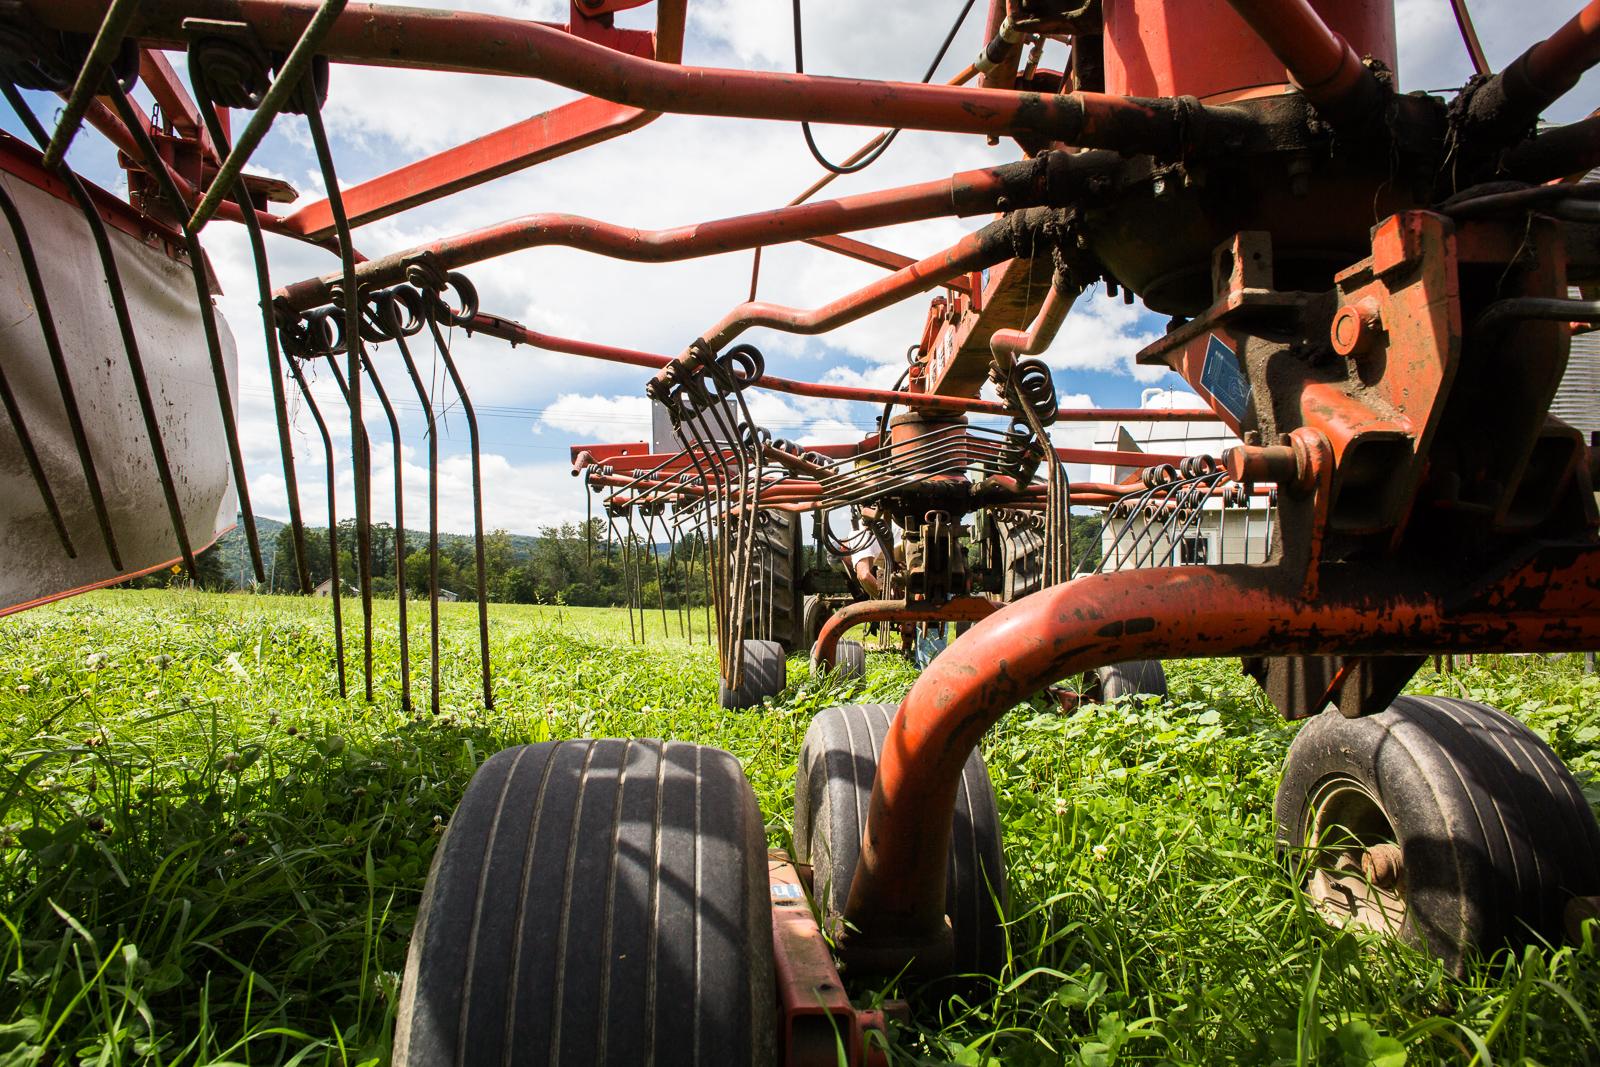 Farm equipment at Ayers Brook Farm in Randolph, Vermont.